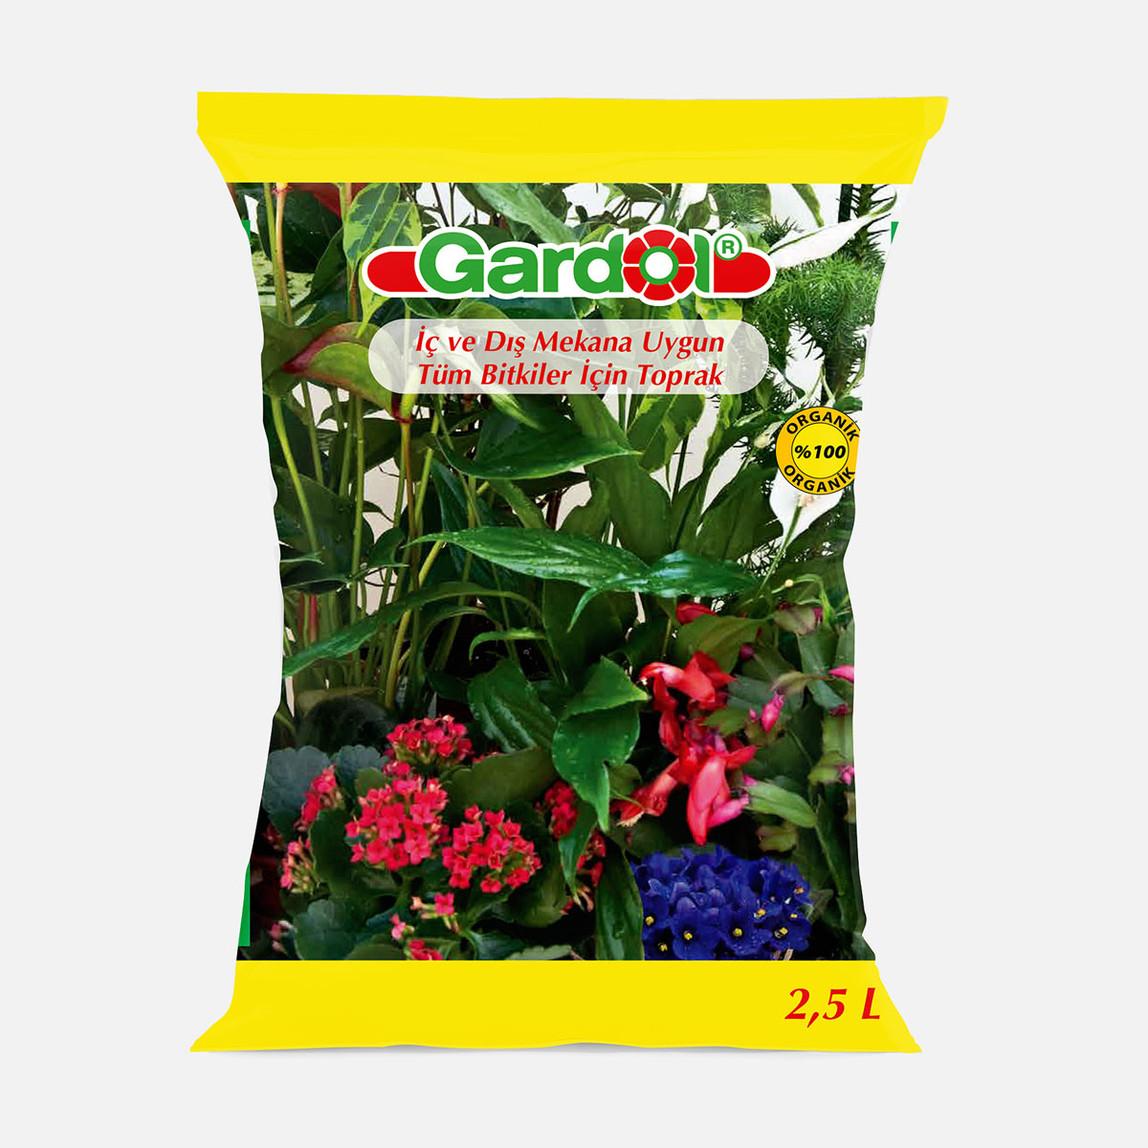 Gardol Cocopeat Bitki Toprağı 2,5 lt